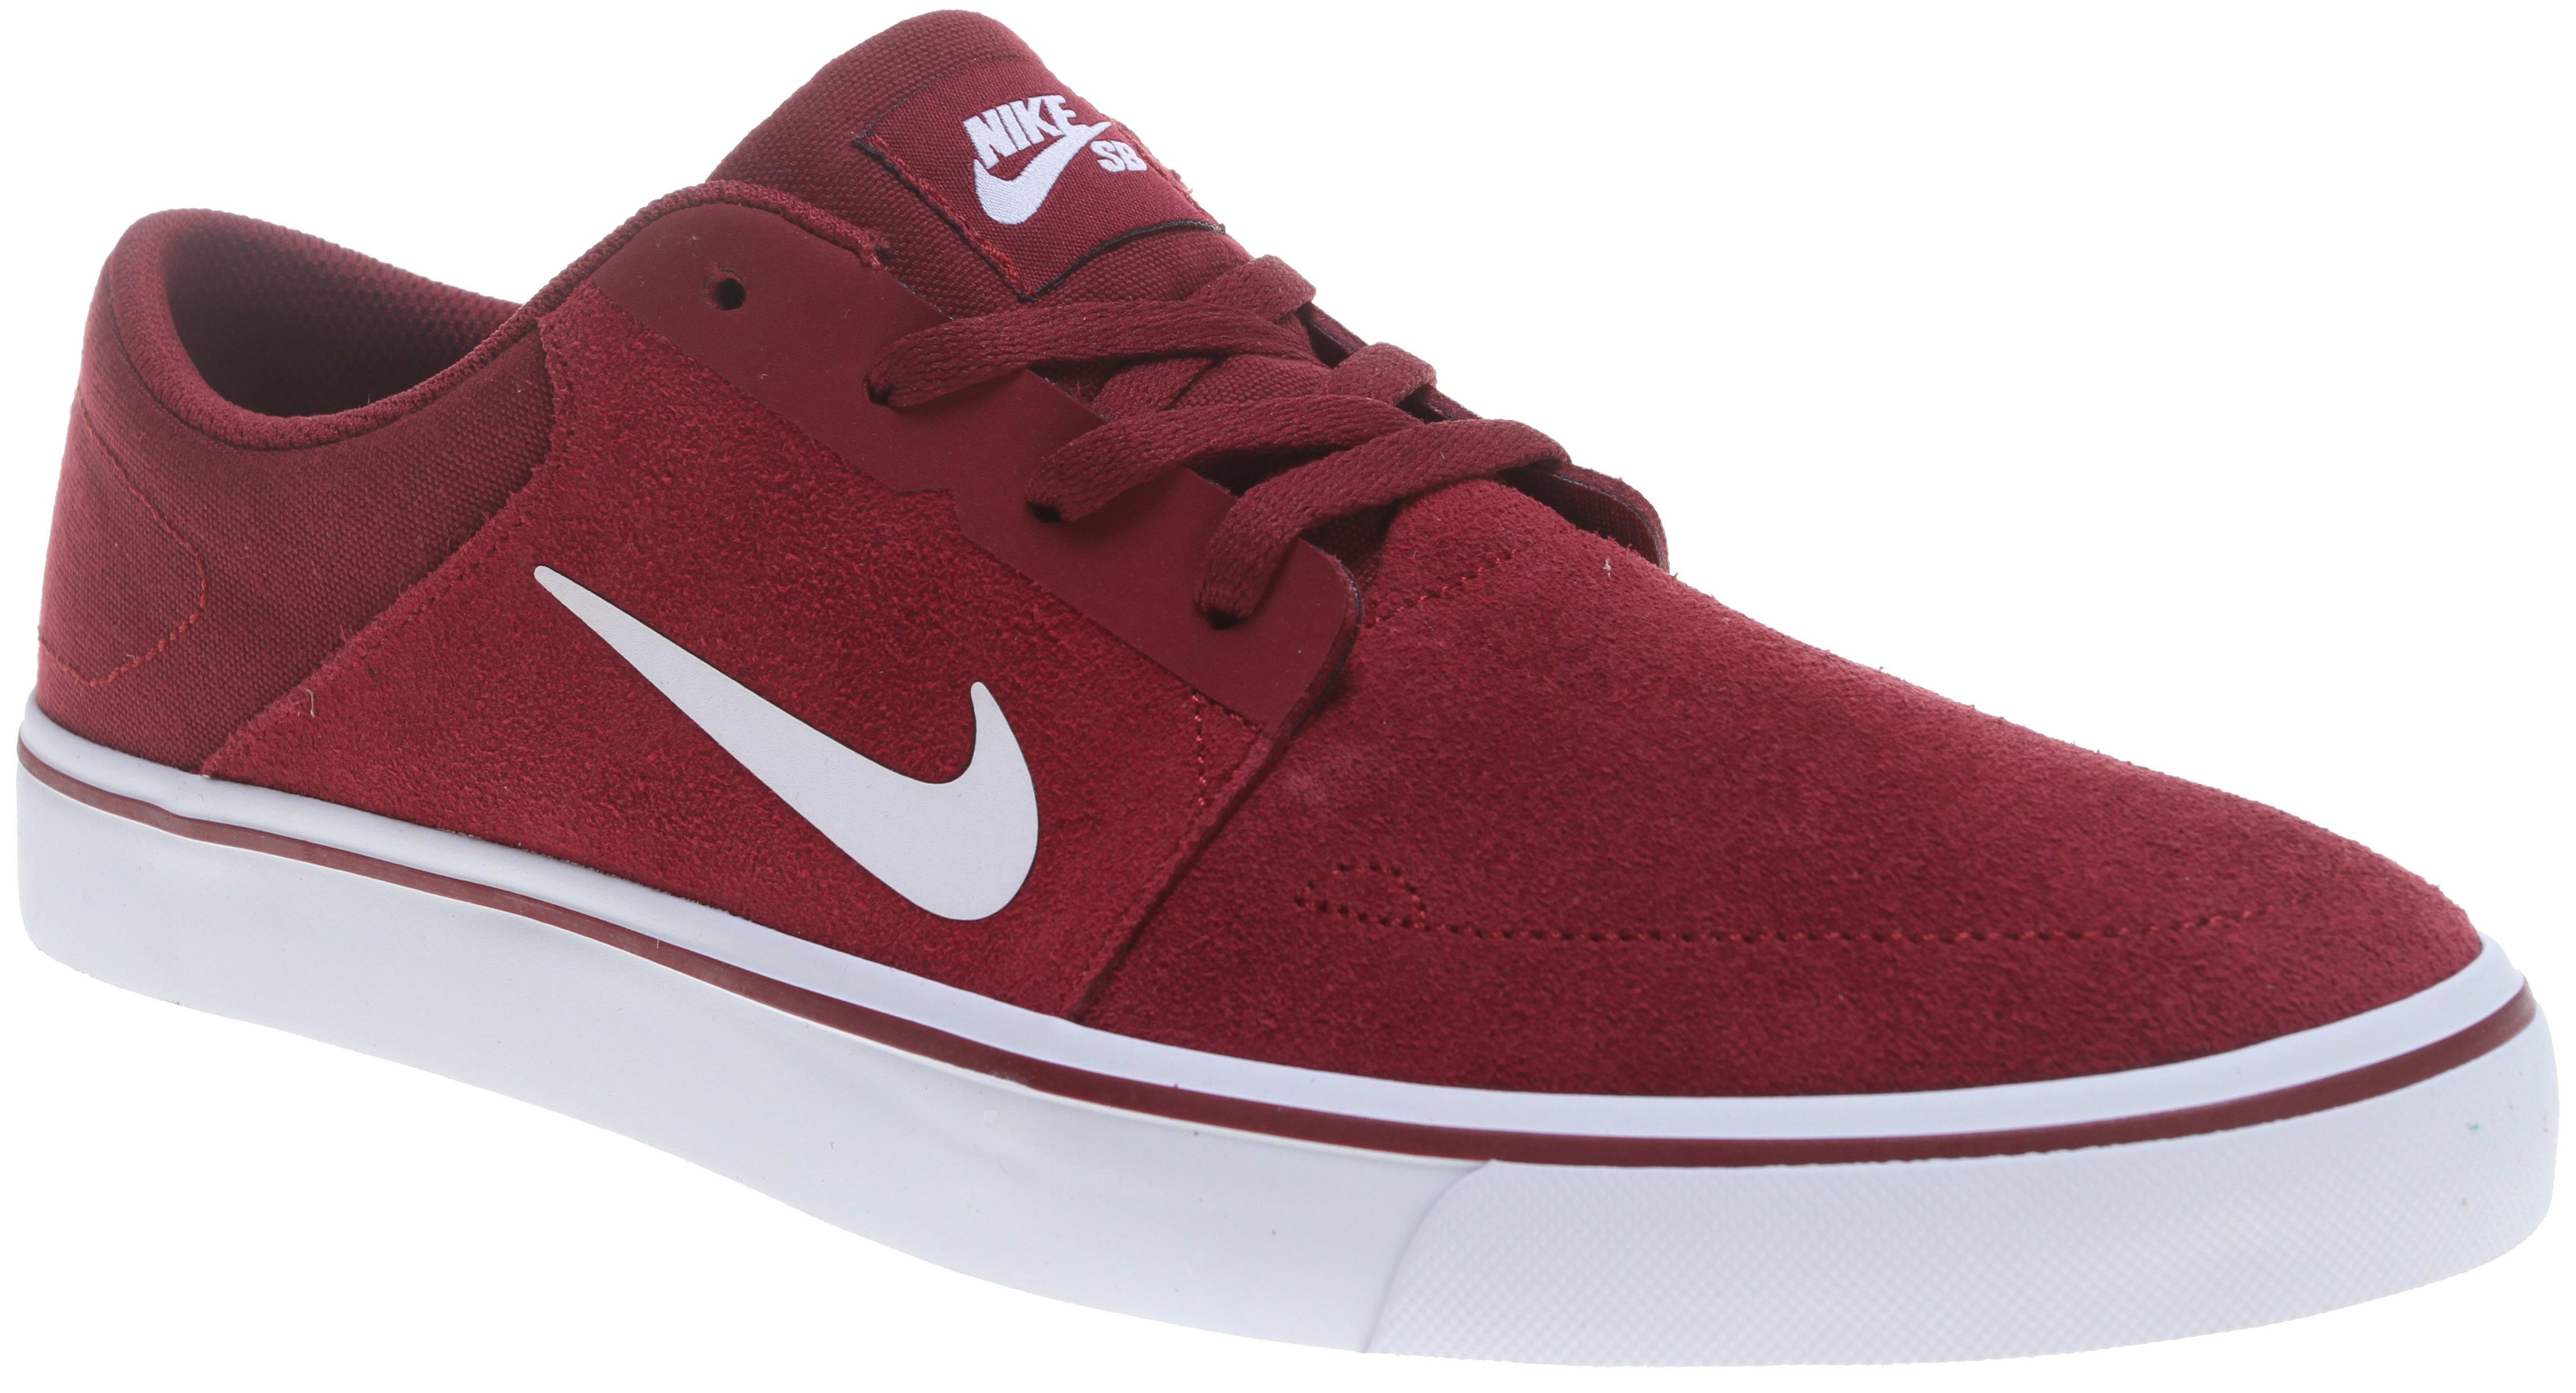 Nike Sb Shoes Discount